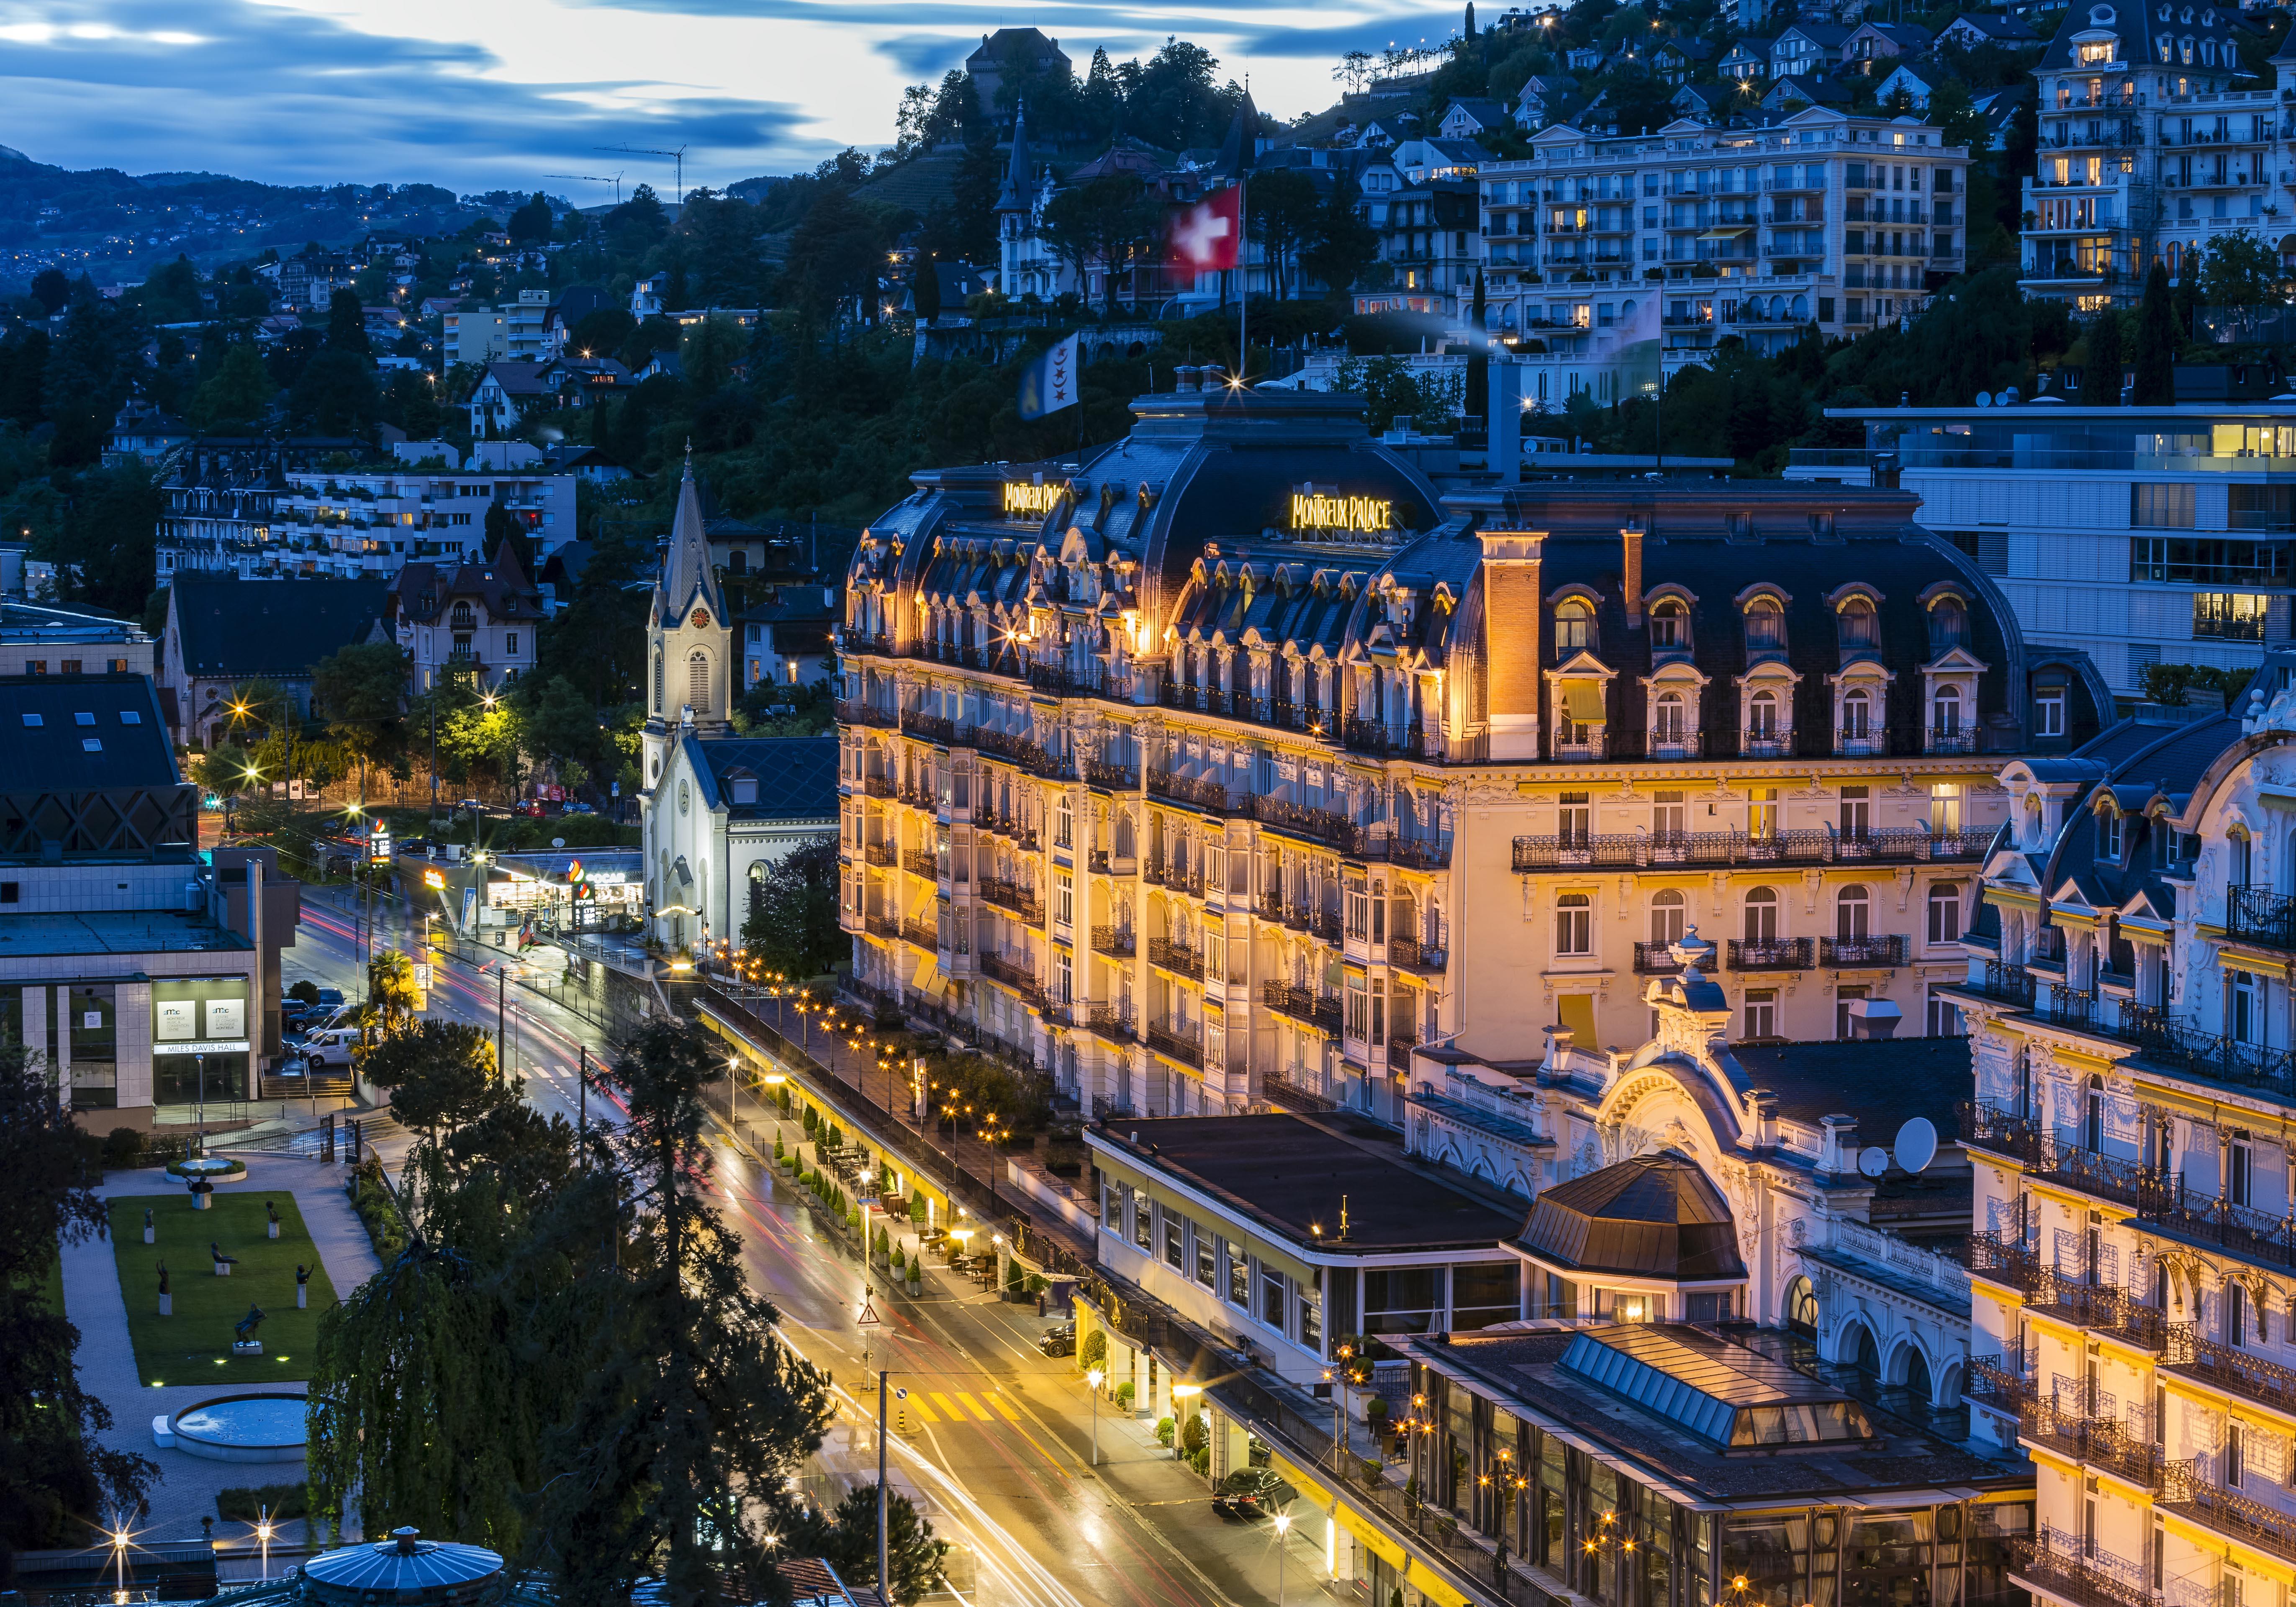 The Town, Montreux, Switzerland